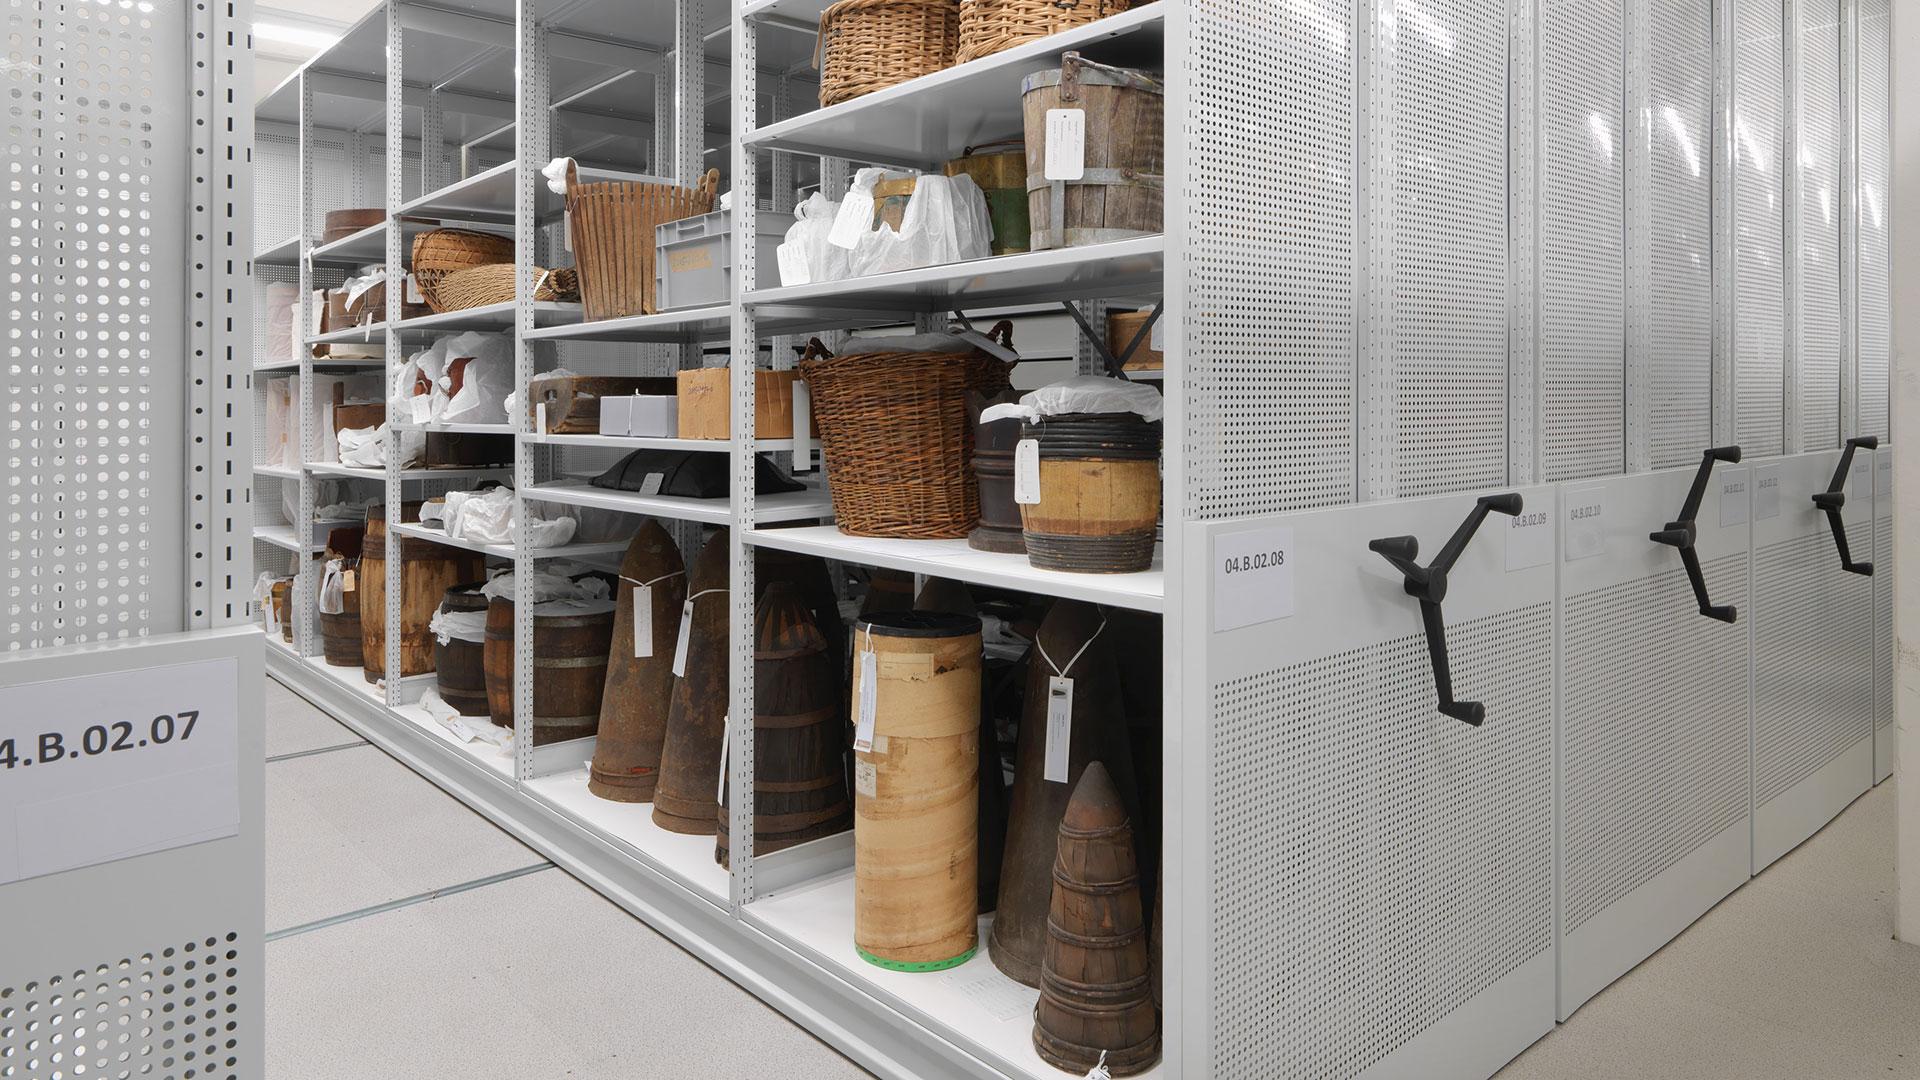 Regalsysteme-Archivregal-Rollregal-Museum-RR409-mauser-16-9RdWVfGOtKKIaI